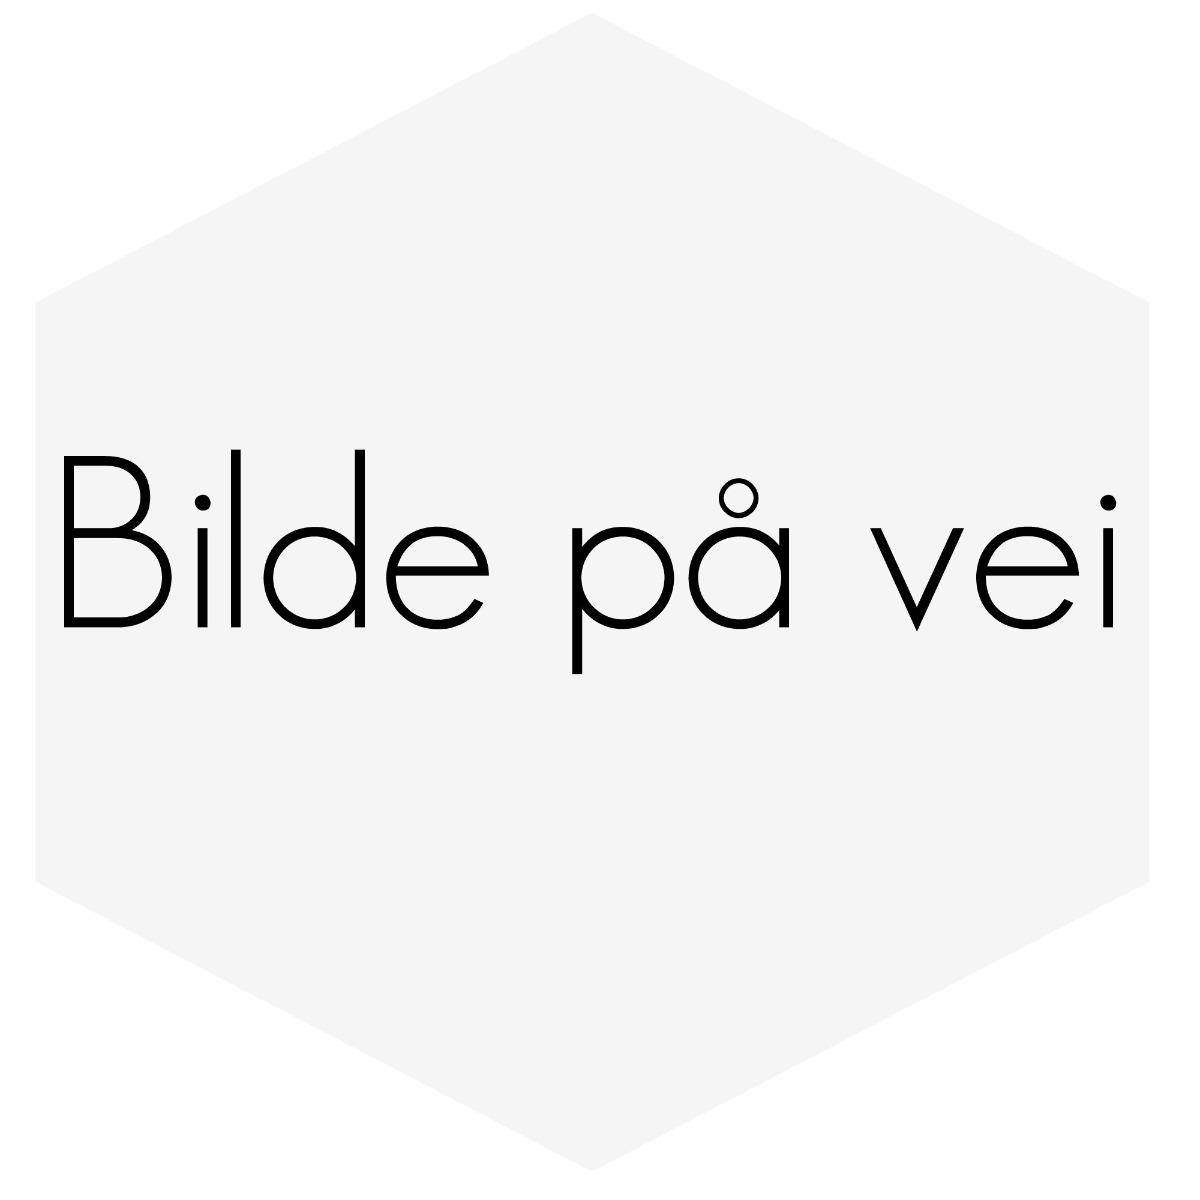 SPOILERLAMPE/FOGLAMP VOLVO S60 05>> HØYRE 8693336